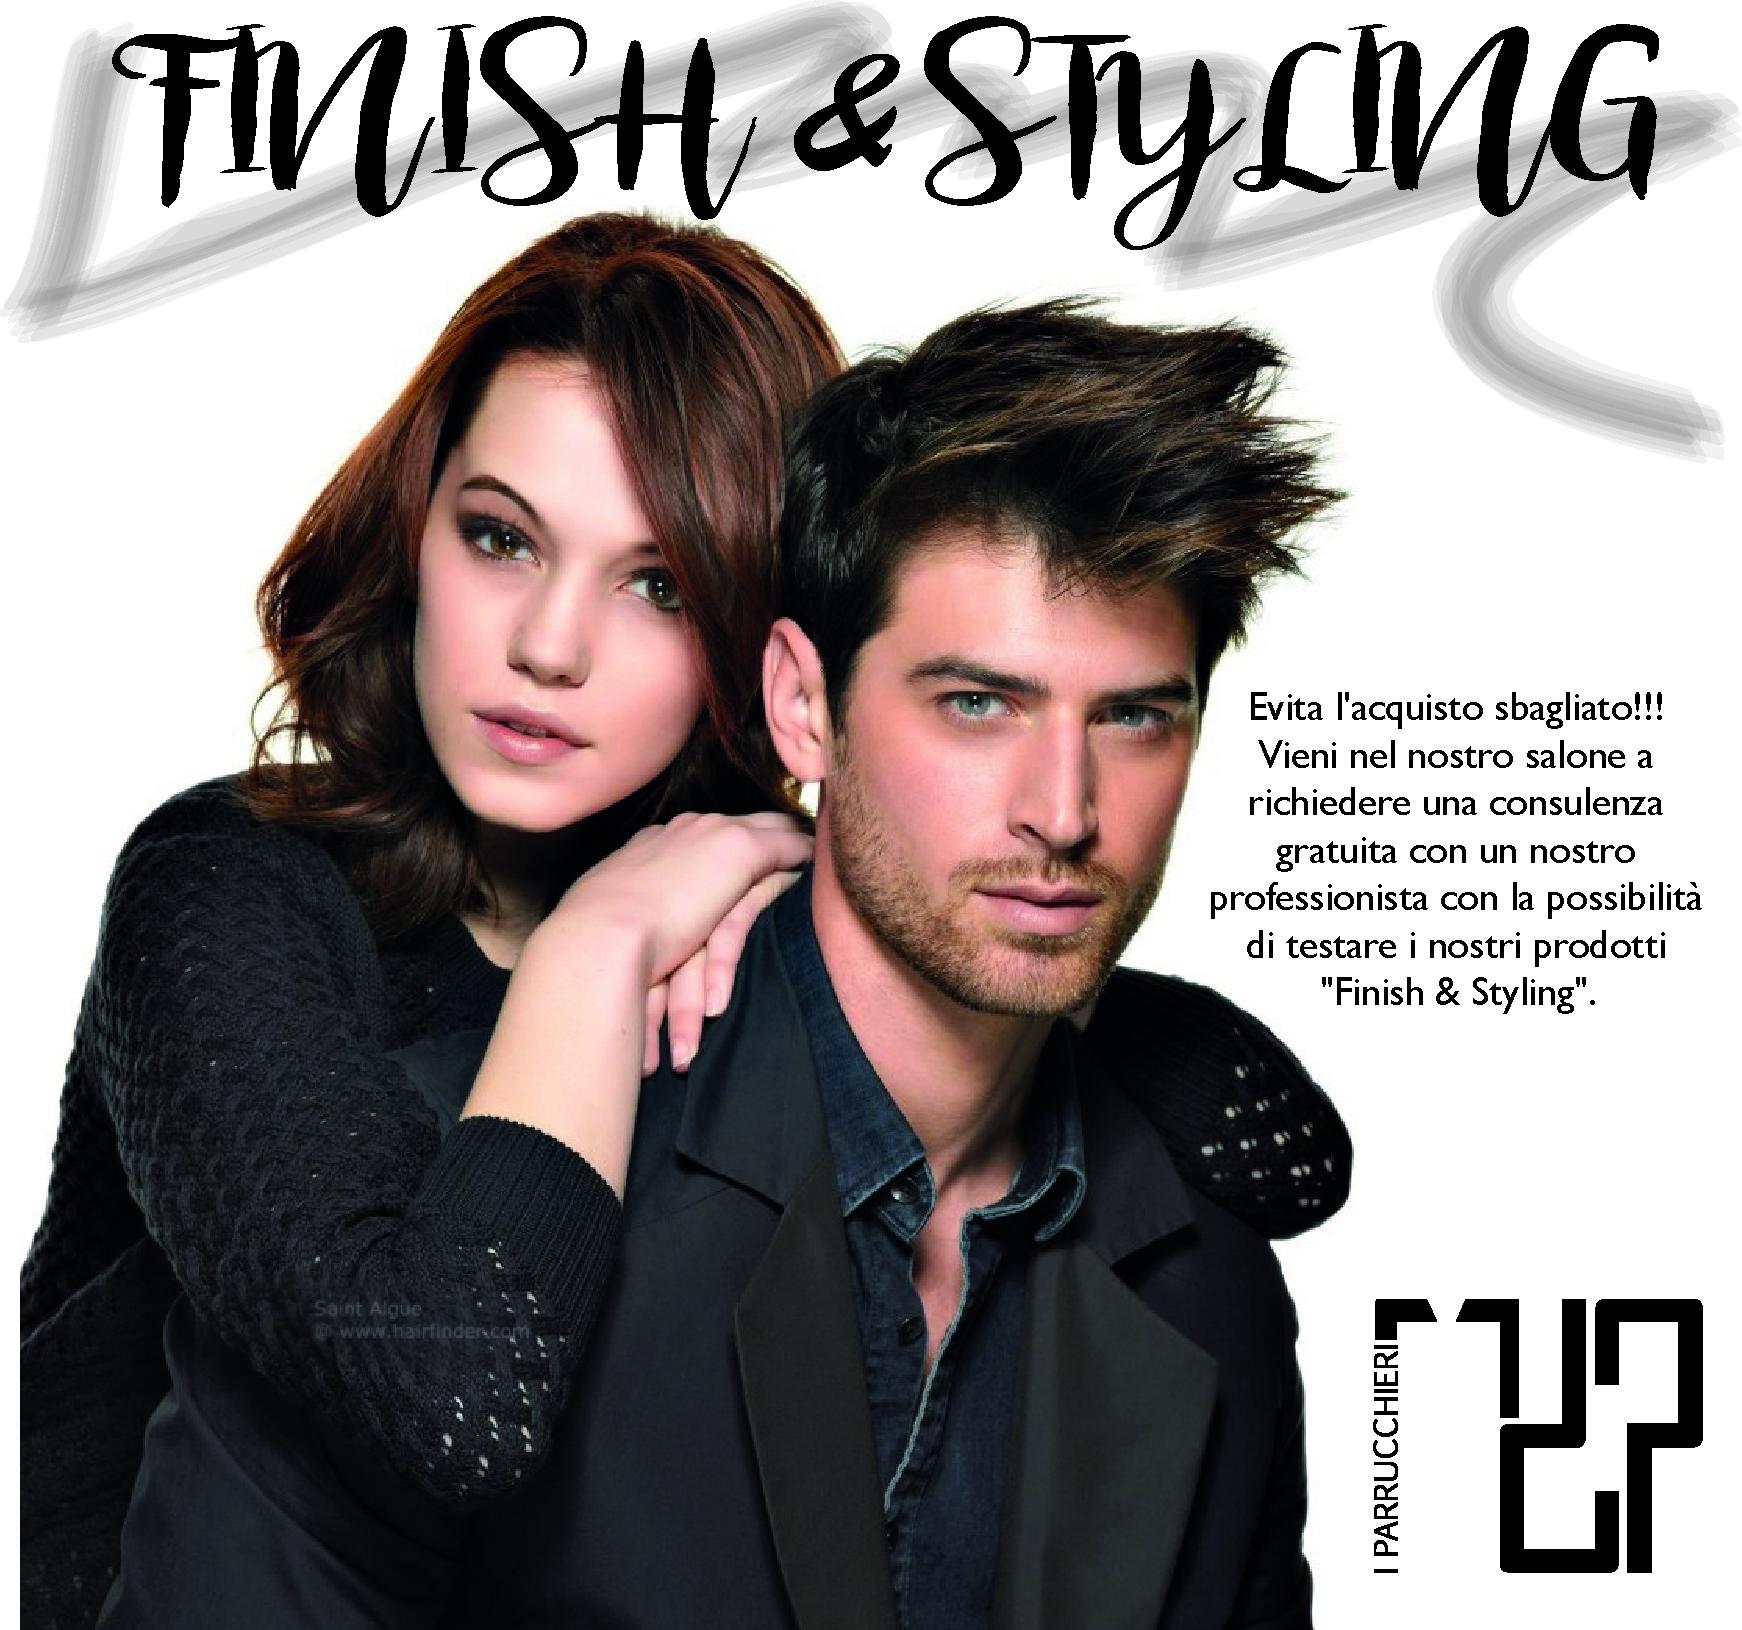 finish&styling2.jpg